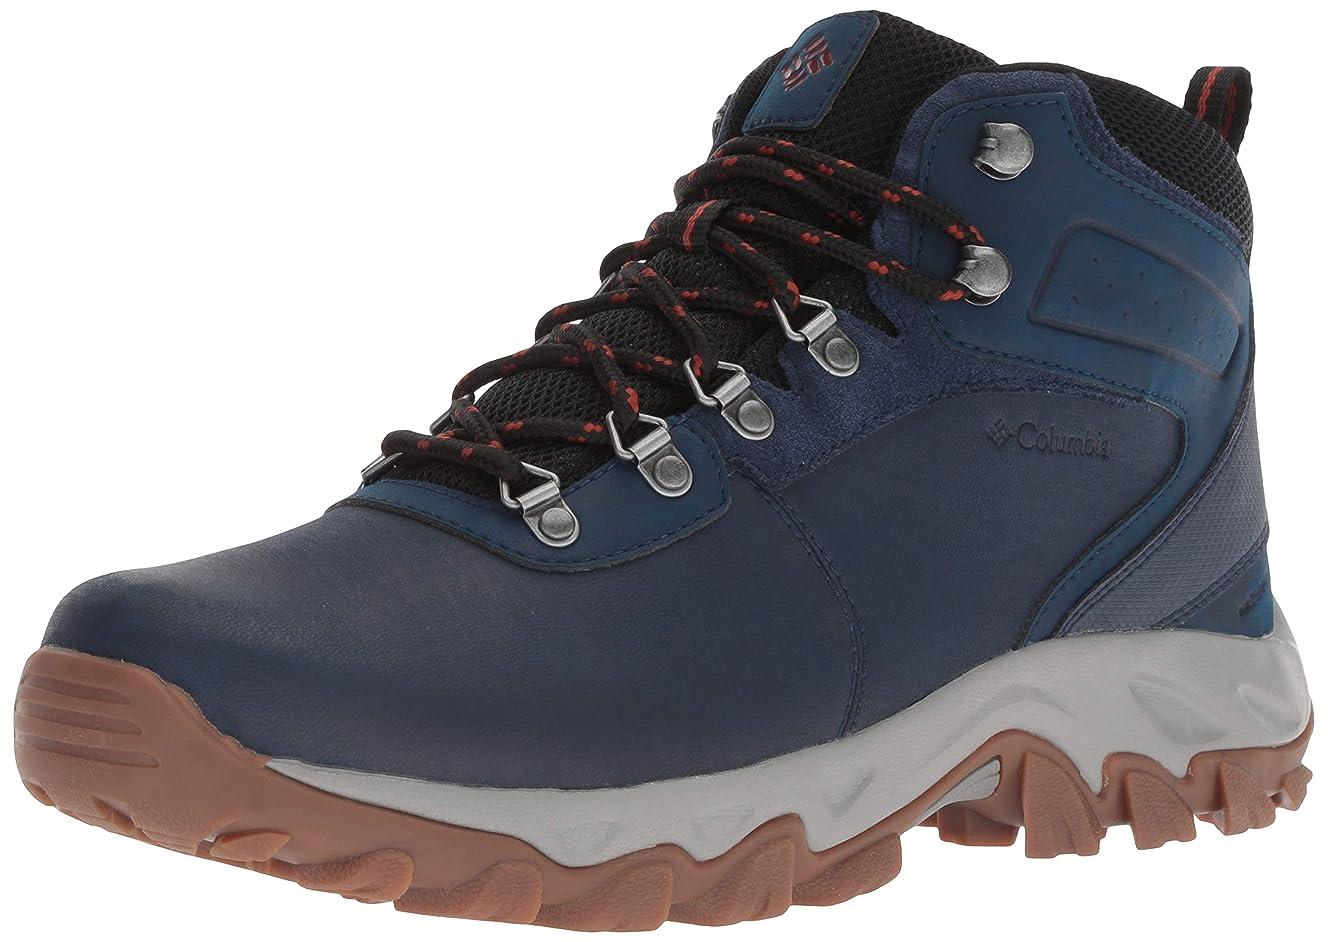 Columbia Men's Newton Ridge Plus Ii Waterproof Wide Ankle Boot